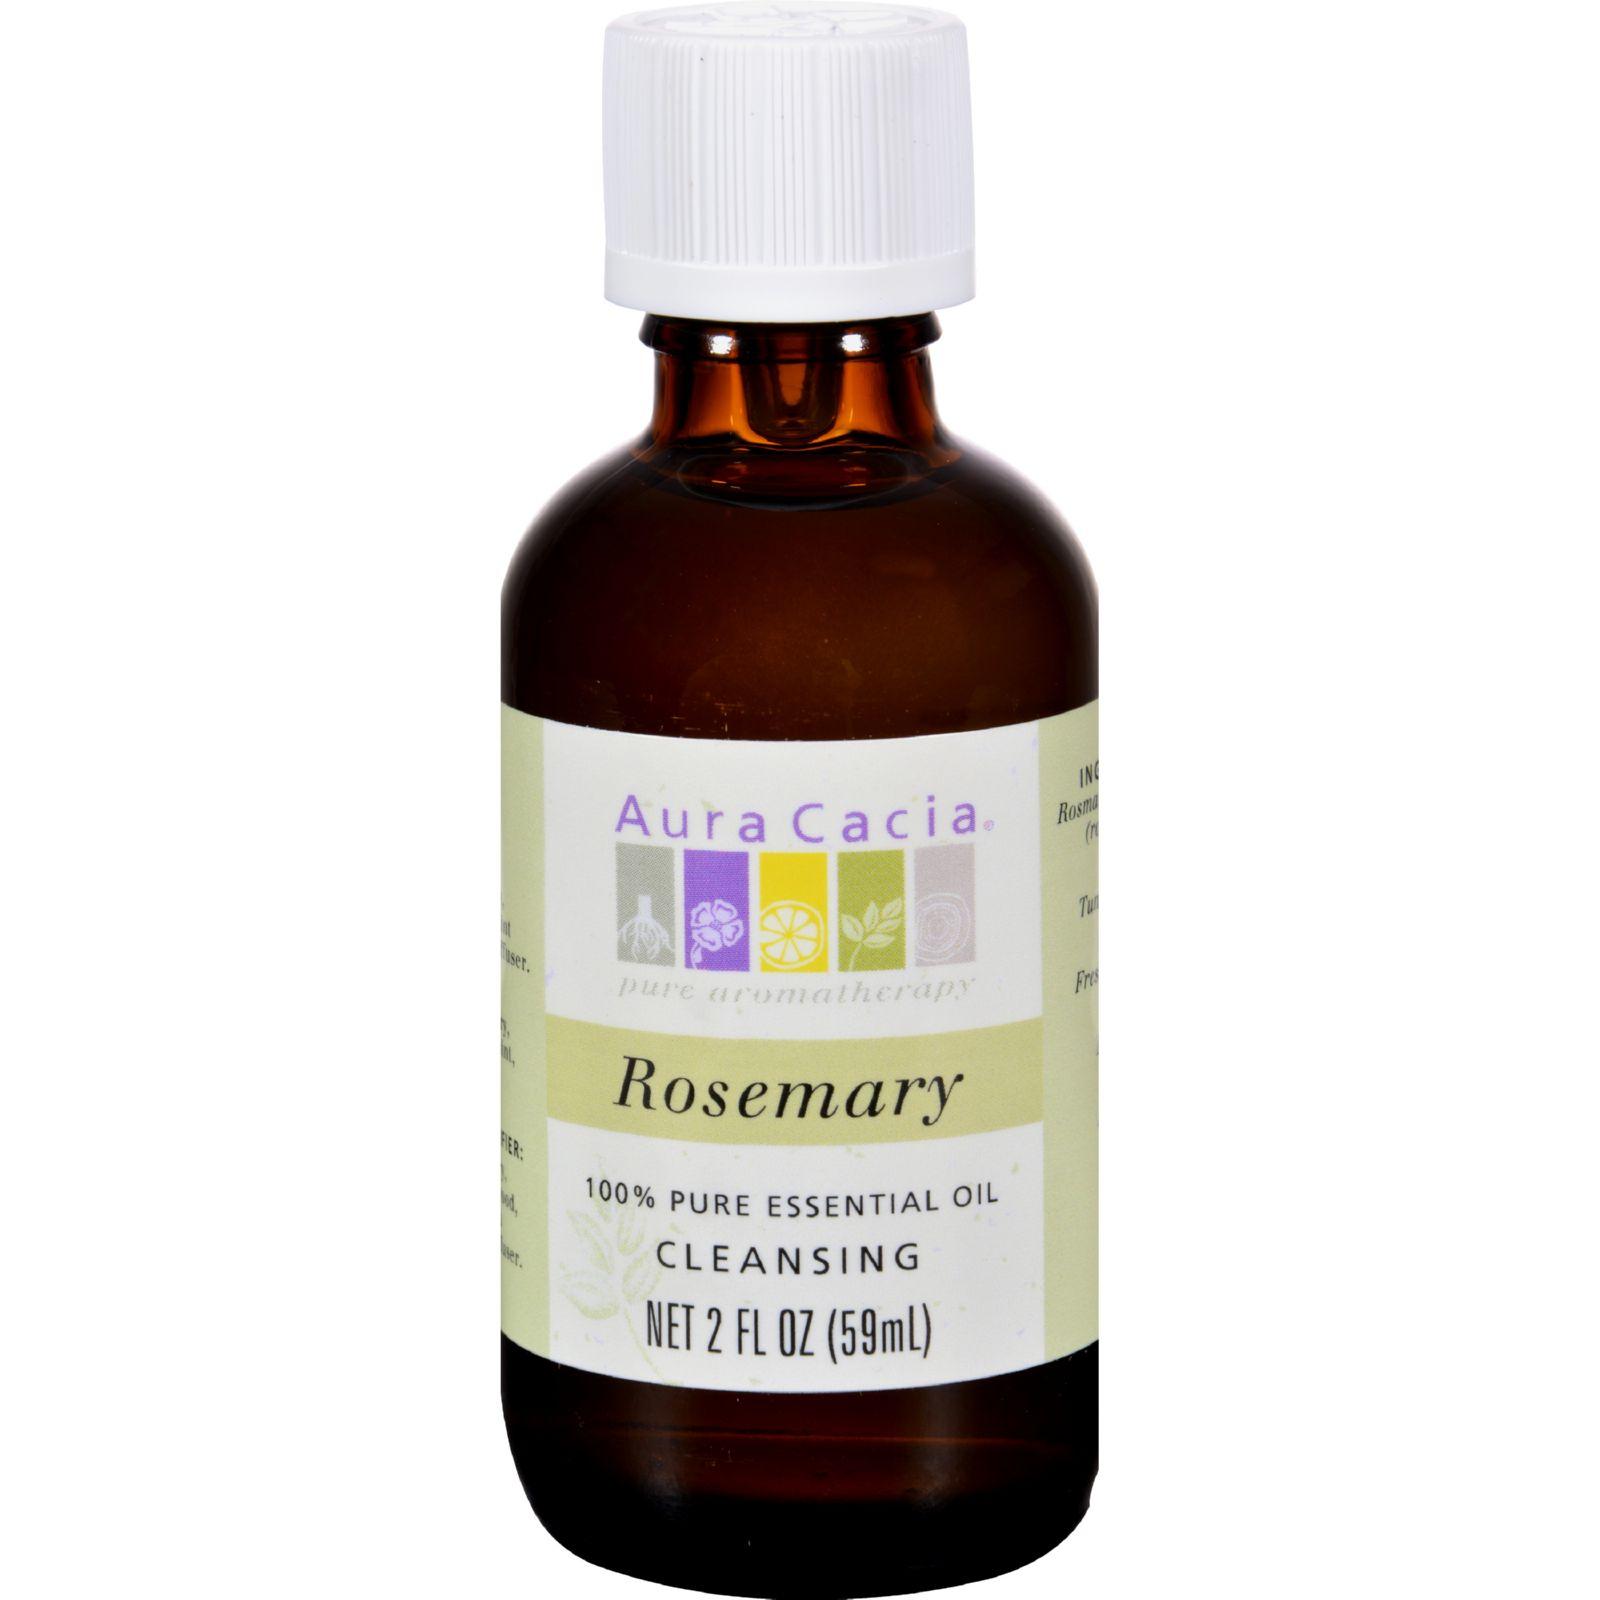 Aura Cacia 100% Pure Essential Oil Rosemary Cleansing - 2 oz